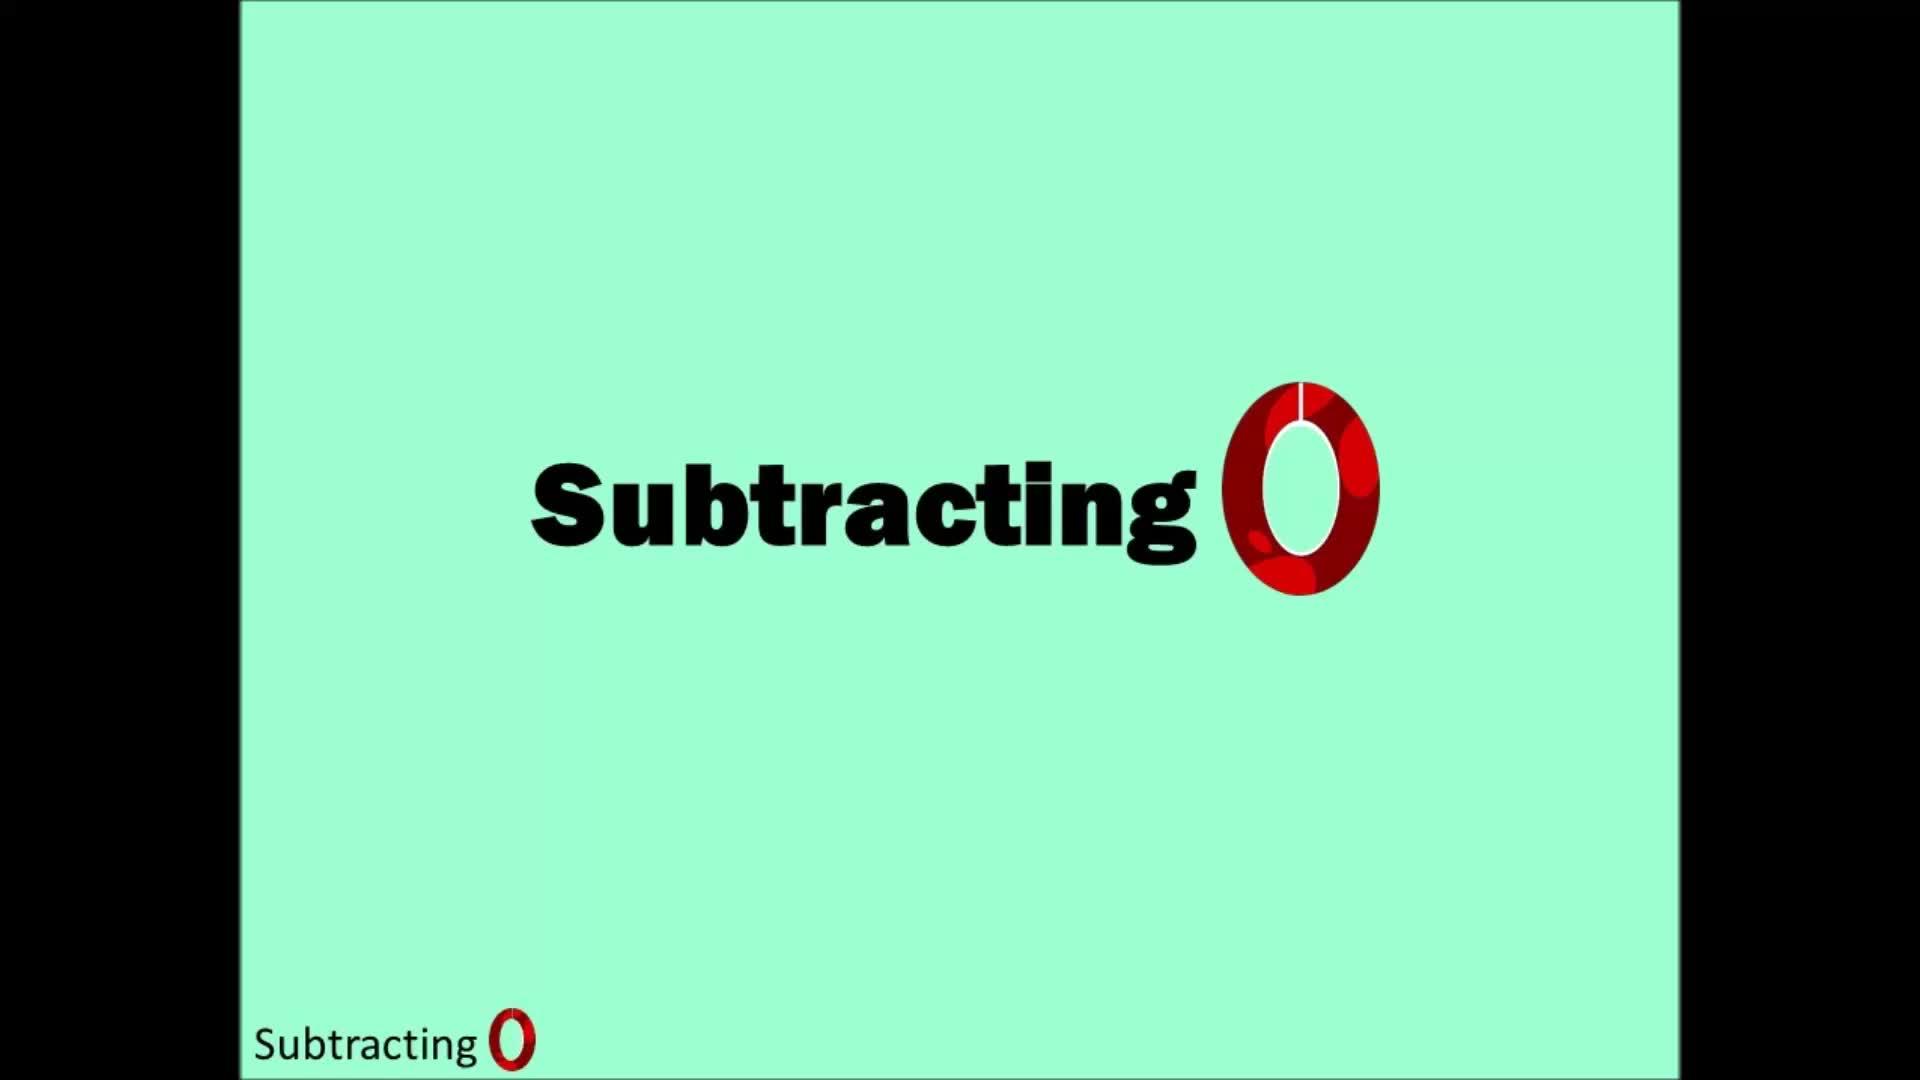 Adding 0